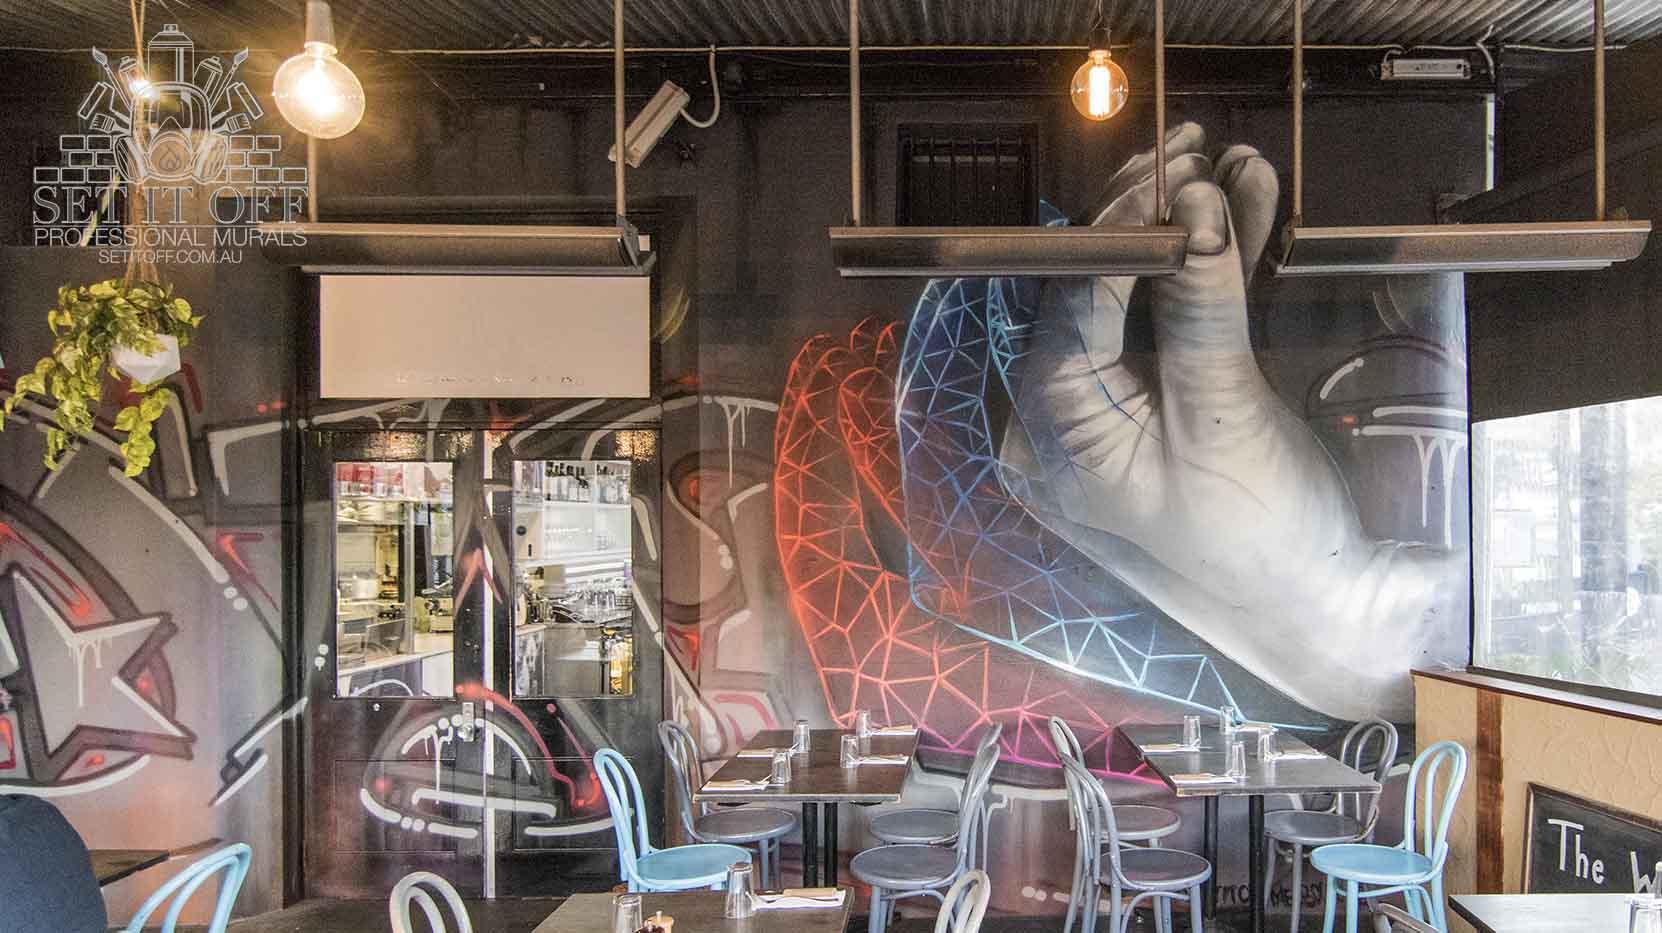 Interior mural in a restaurant